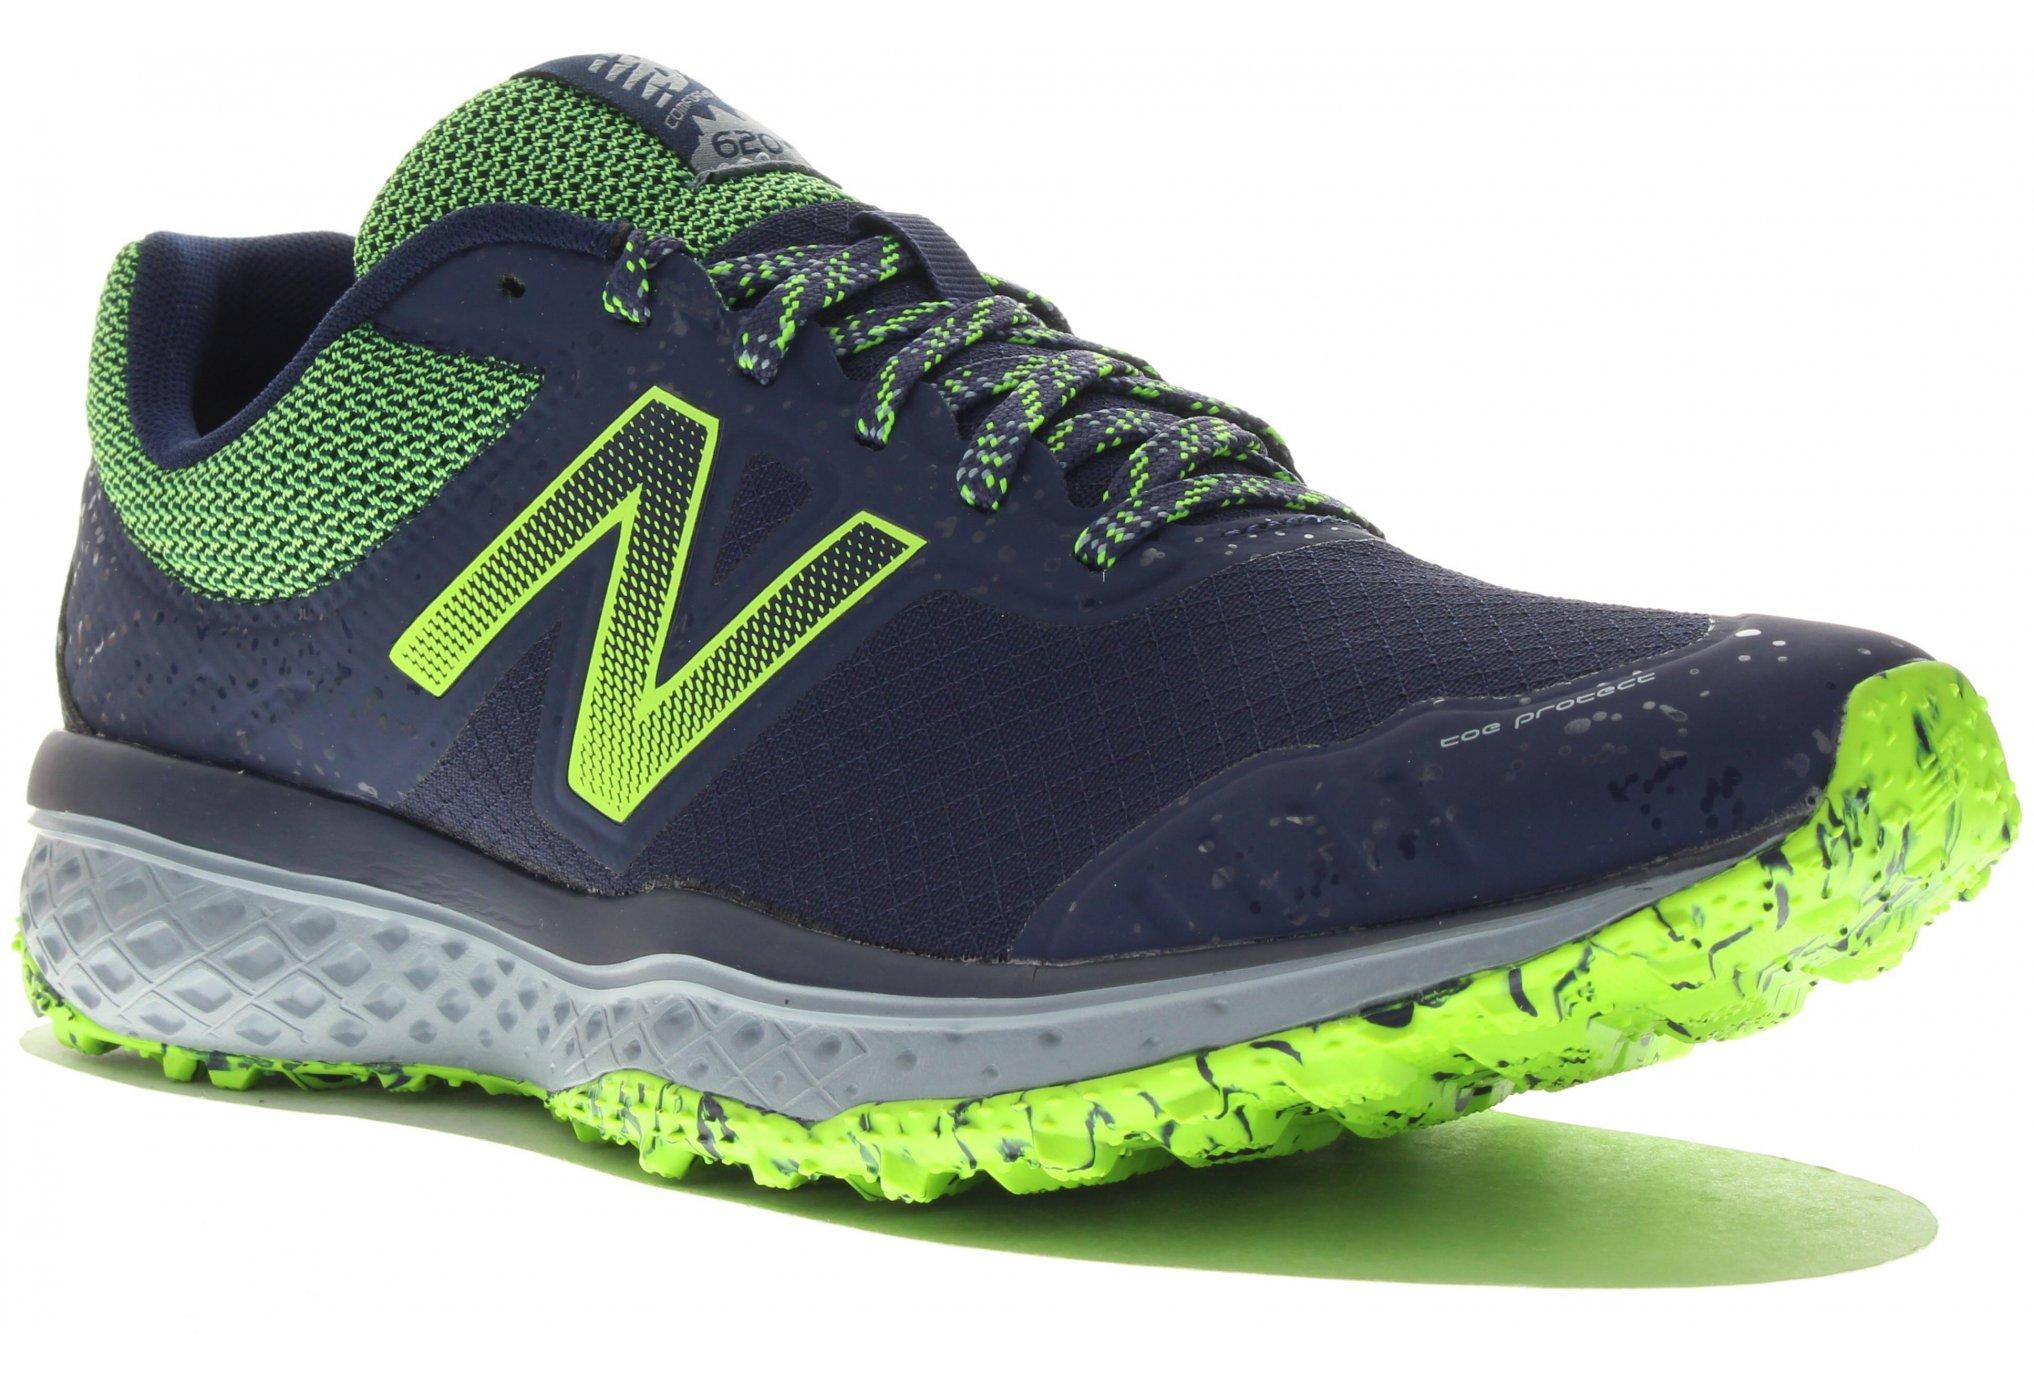 Homme Sports Chaussres New Balance MT620v2 chaussures de